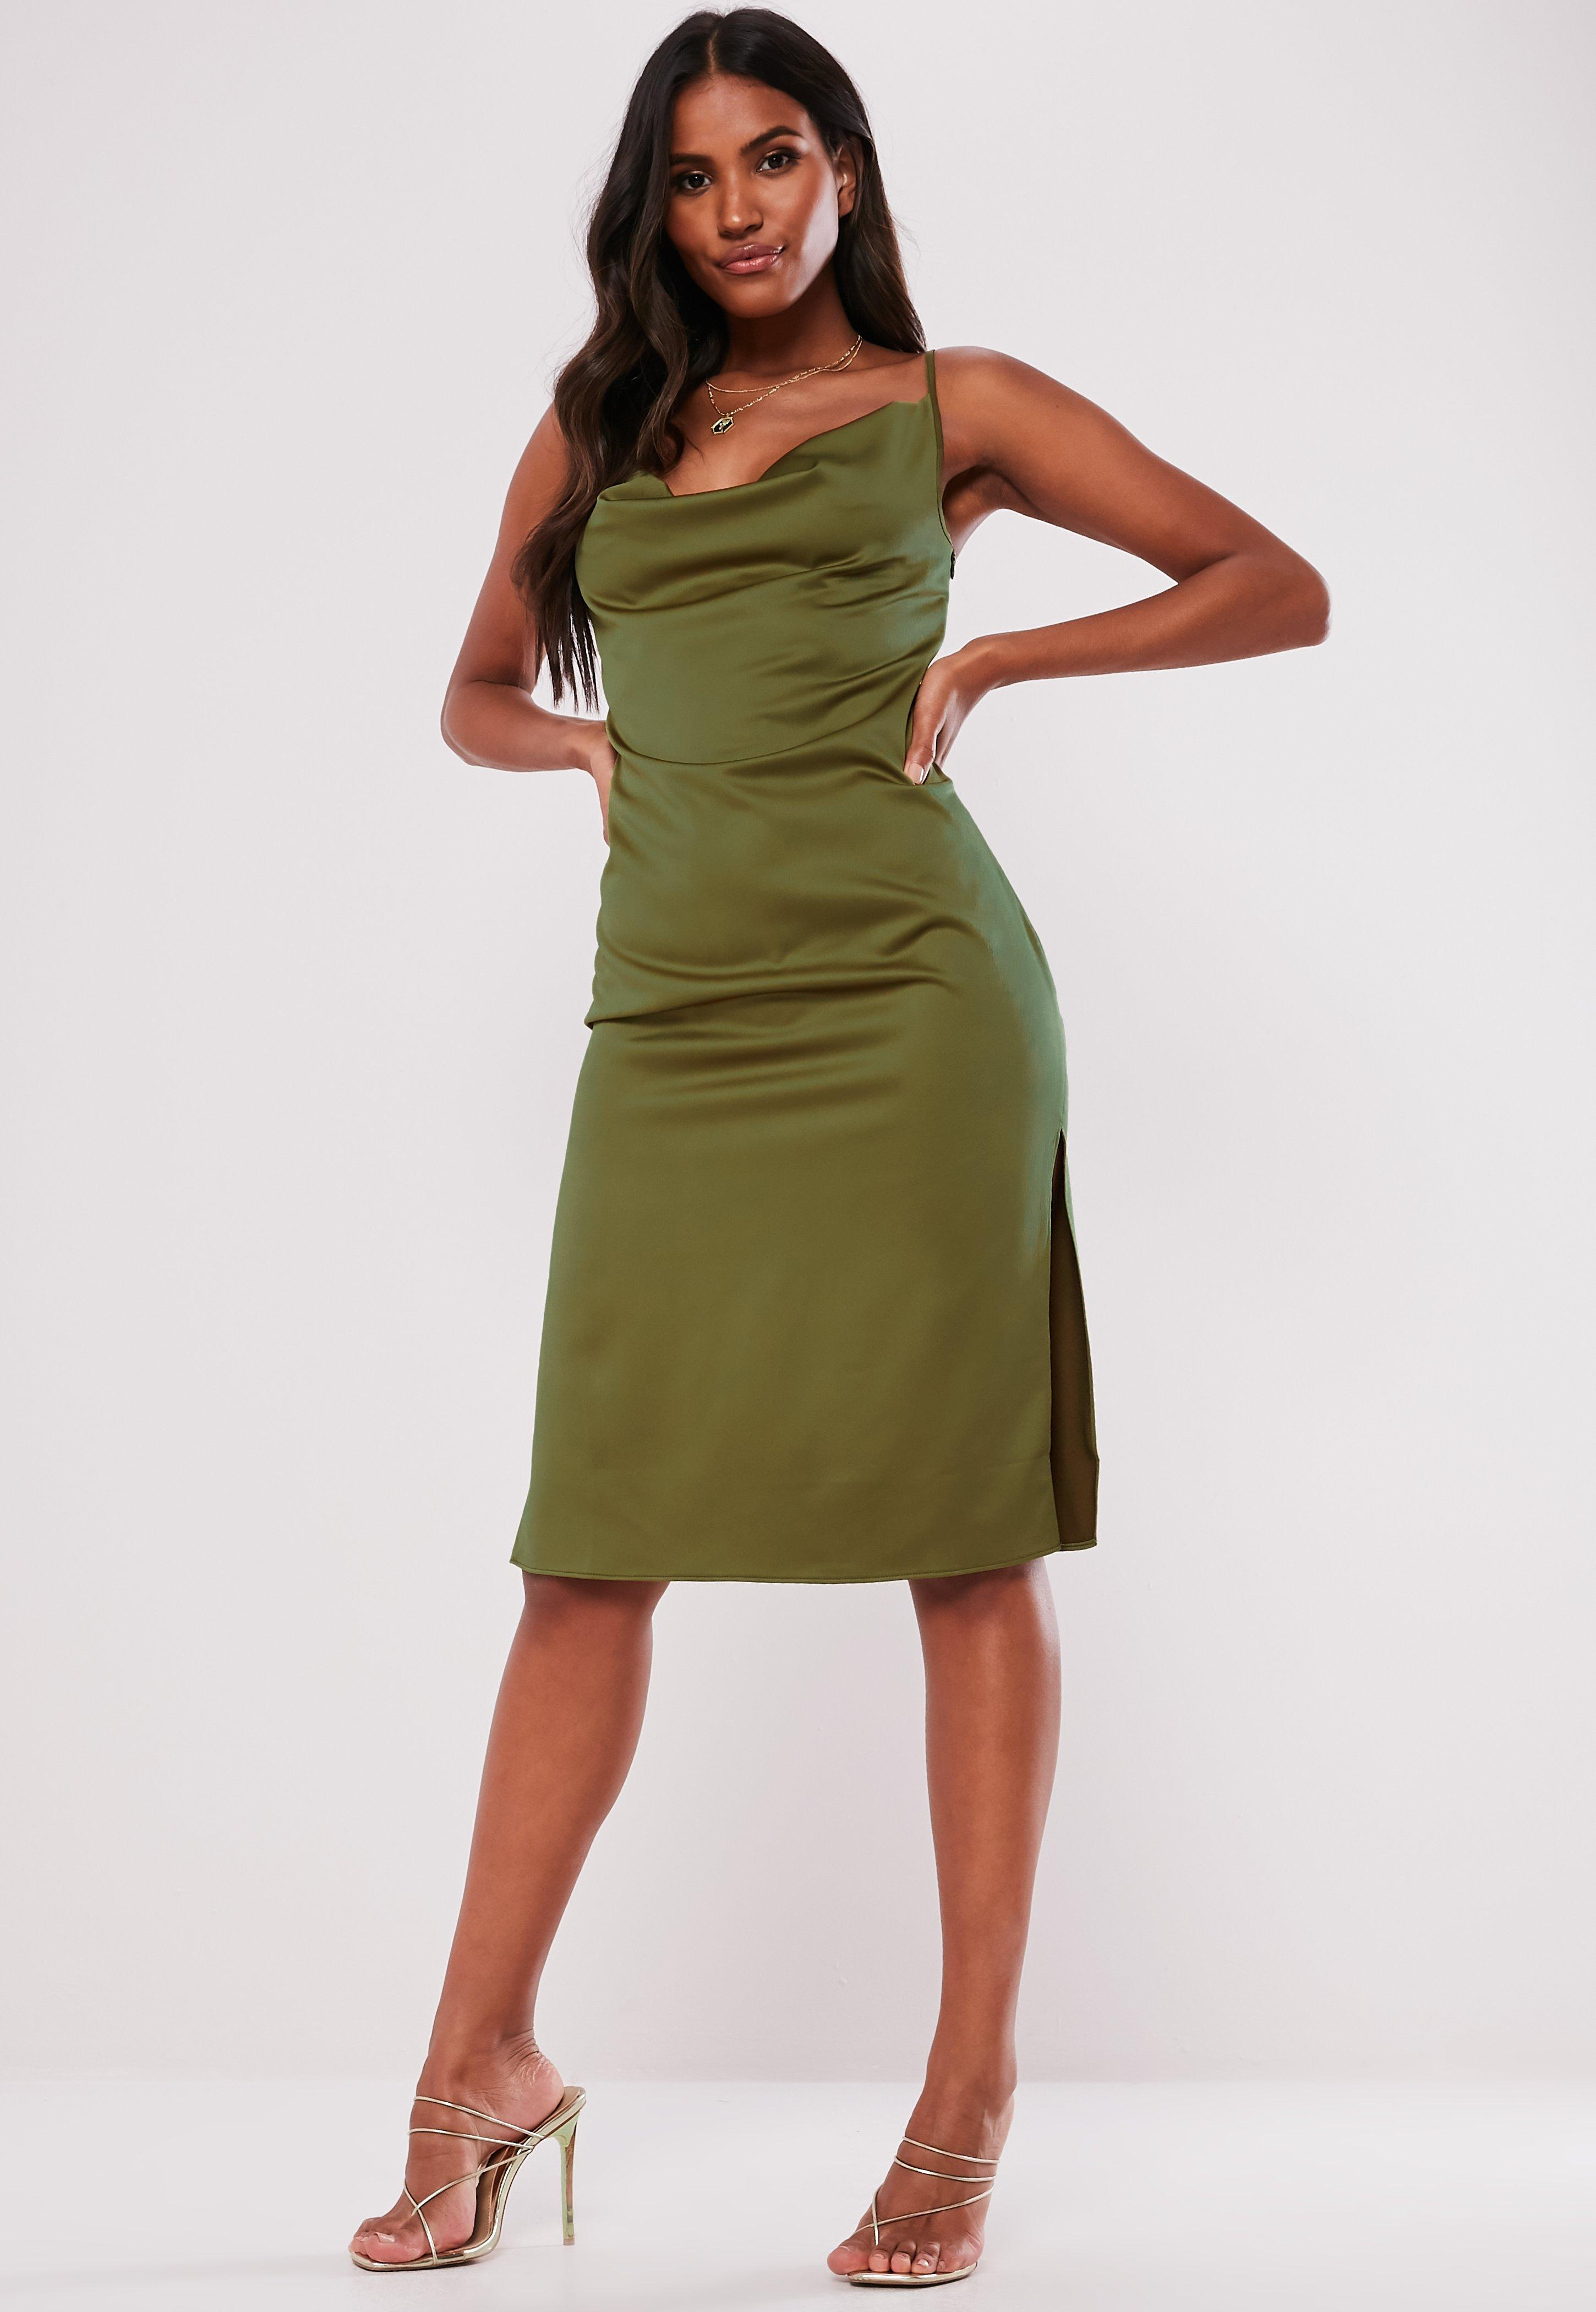 7c022b746f526 Slip Dresses | Shop Cami Dresses - Missguided